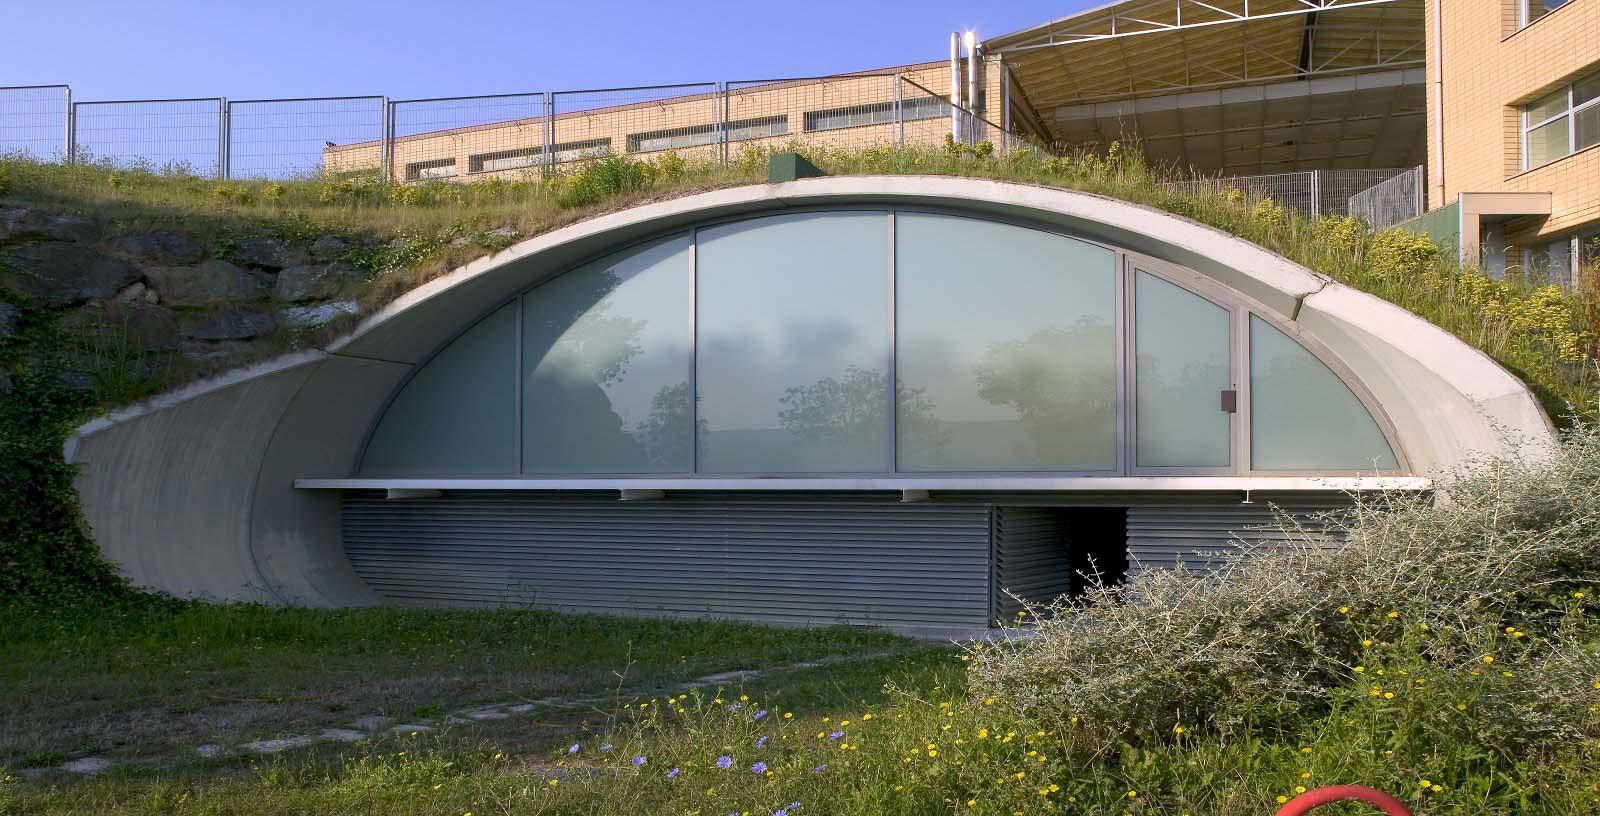 Vizcaya_School_Swimmingpool_05_Architecture_IDOM_C